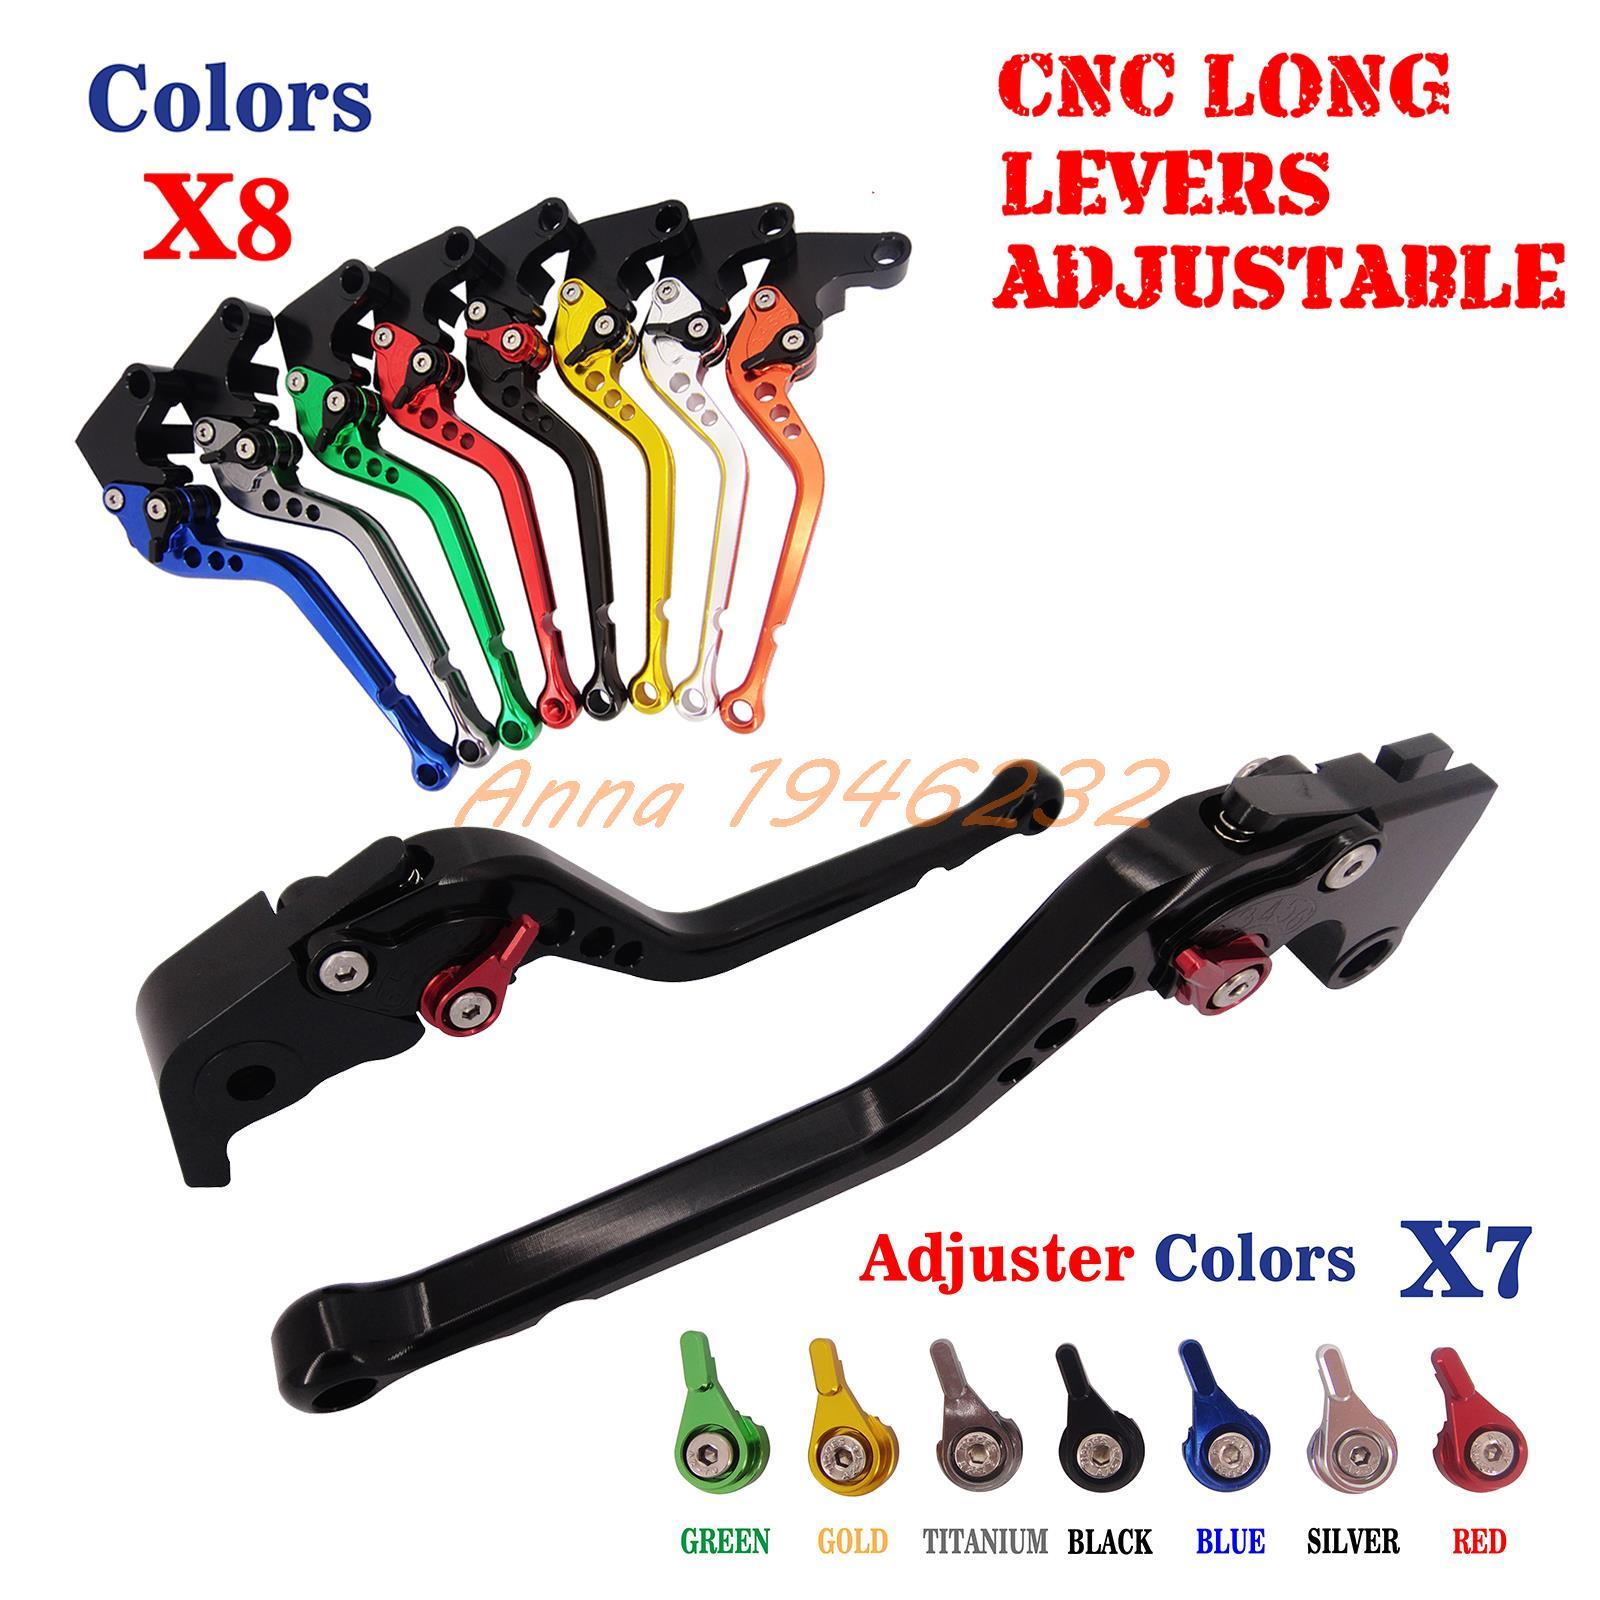 CNC Long Adjustable Brake Clutch Lever For Yamaha XJR400 1993-2007 FZ400 1997 FZS600 Fazer 1998-2003FZS 600 NEW 04 05 06 07 08 09 10 11 12 13 14 new cnc short straight adjustable brake clutch lever for yamaha majesty 400 t max 500 t max 530